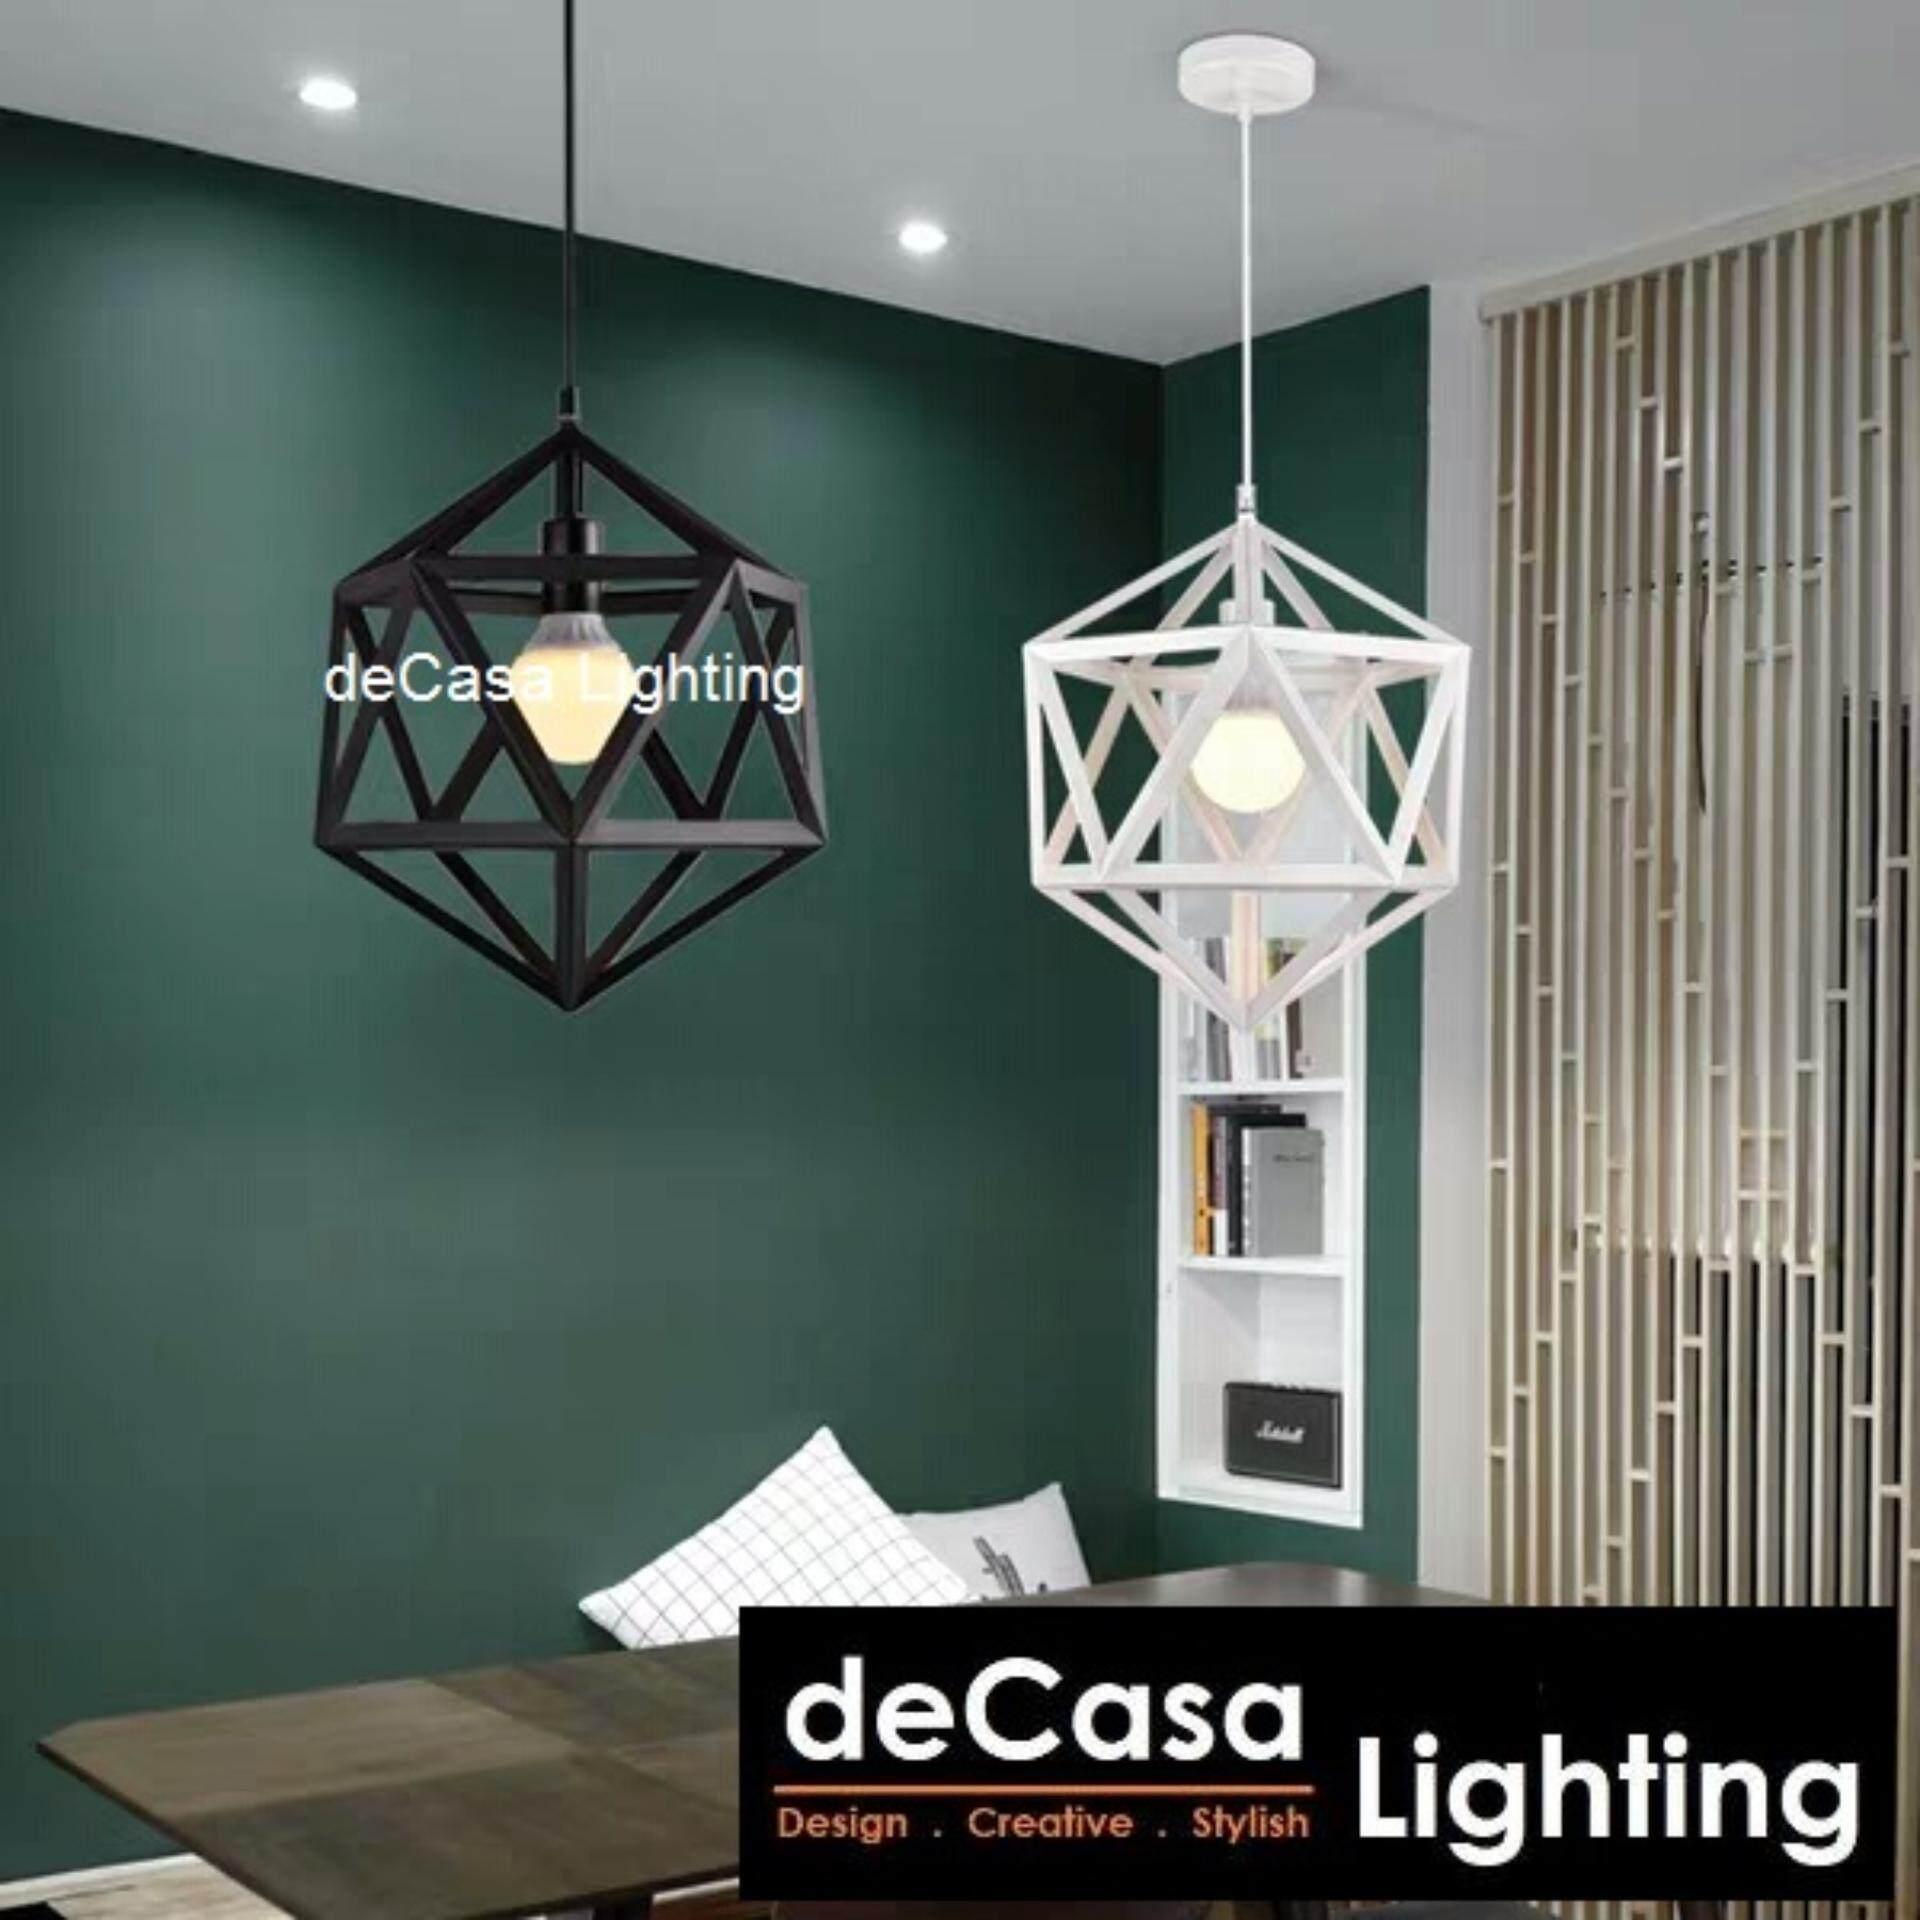 Diamond Black Ceiling Light Hanging Light Brand new and high quality Adjustable length Suitable for dining room, bedroom, living room Great decoration Restaurant Cafe (JL-10153-350-BK)